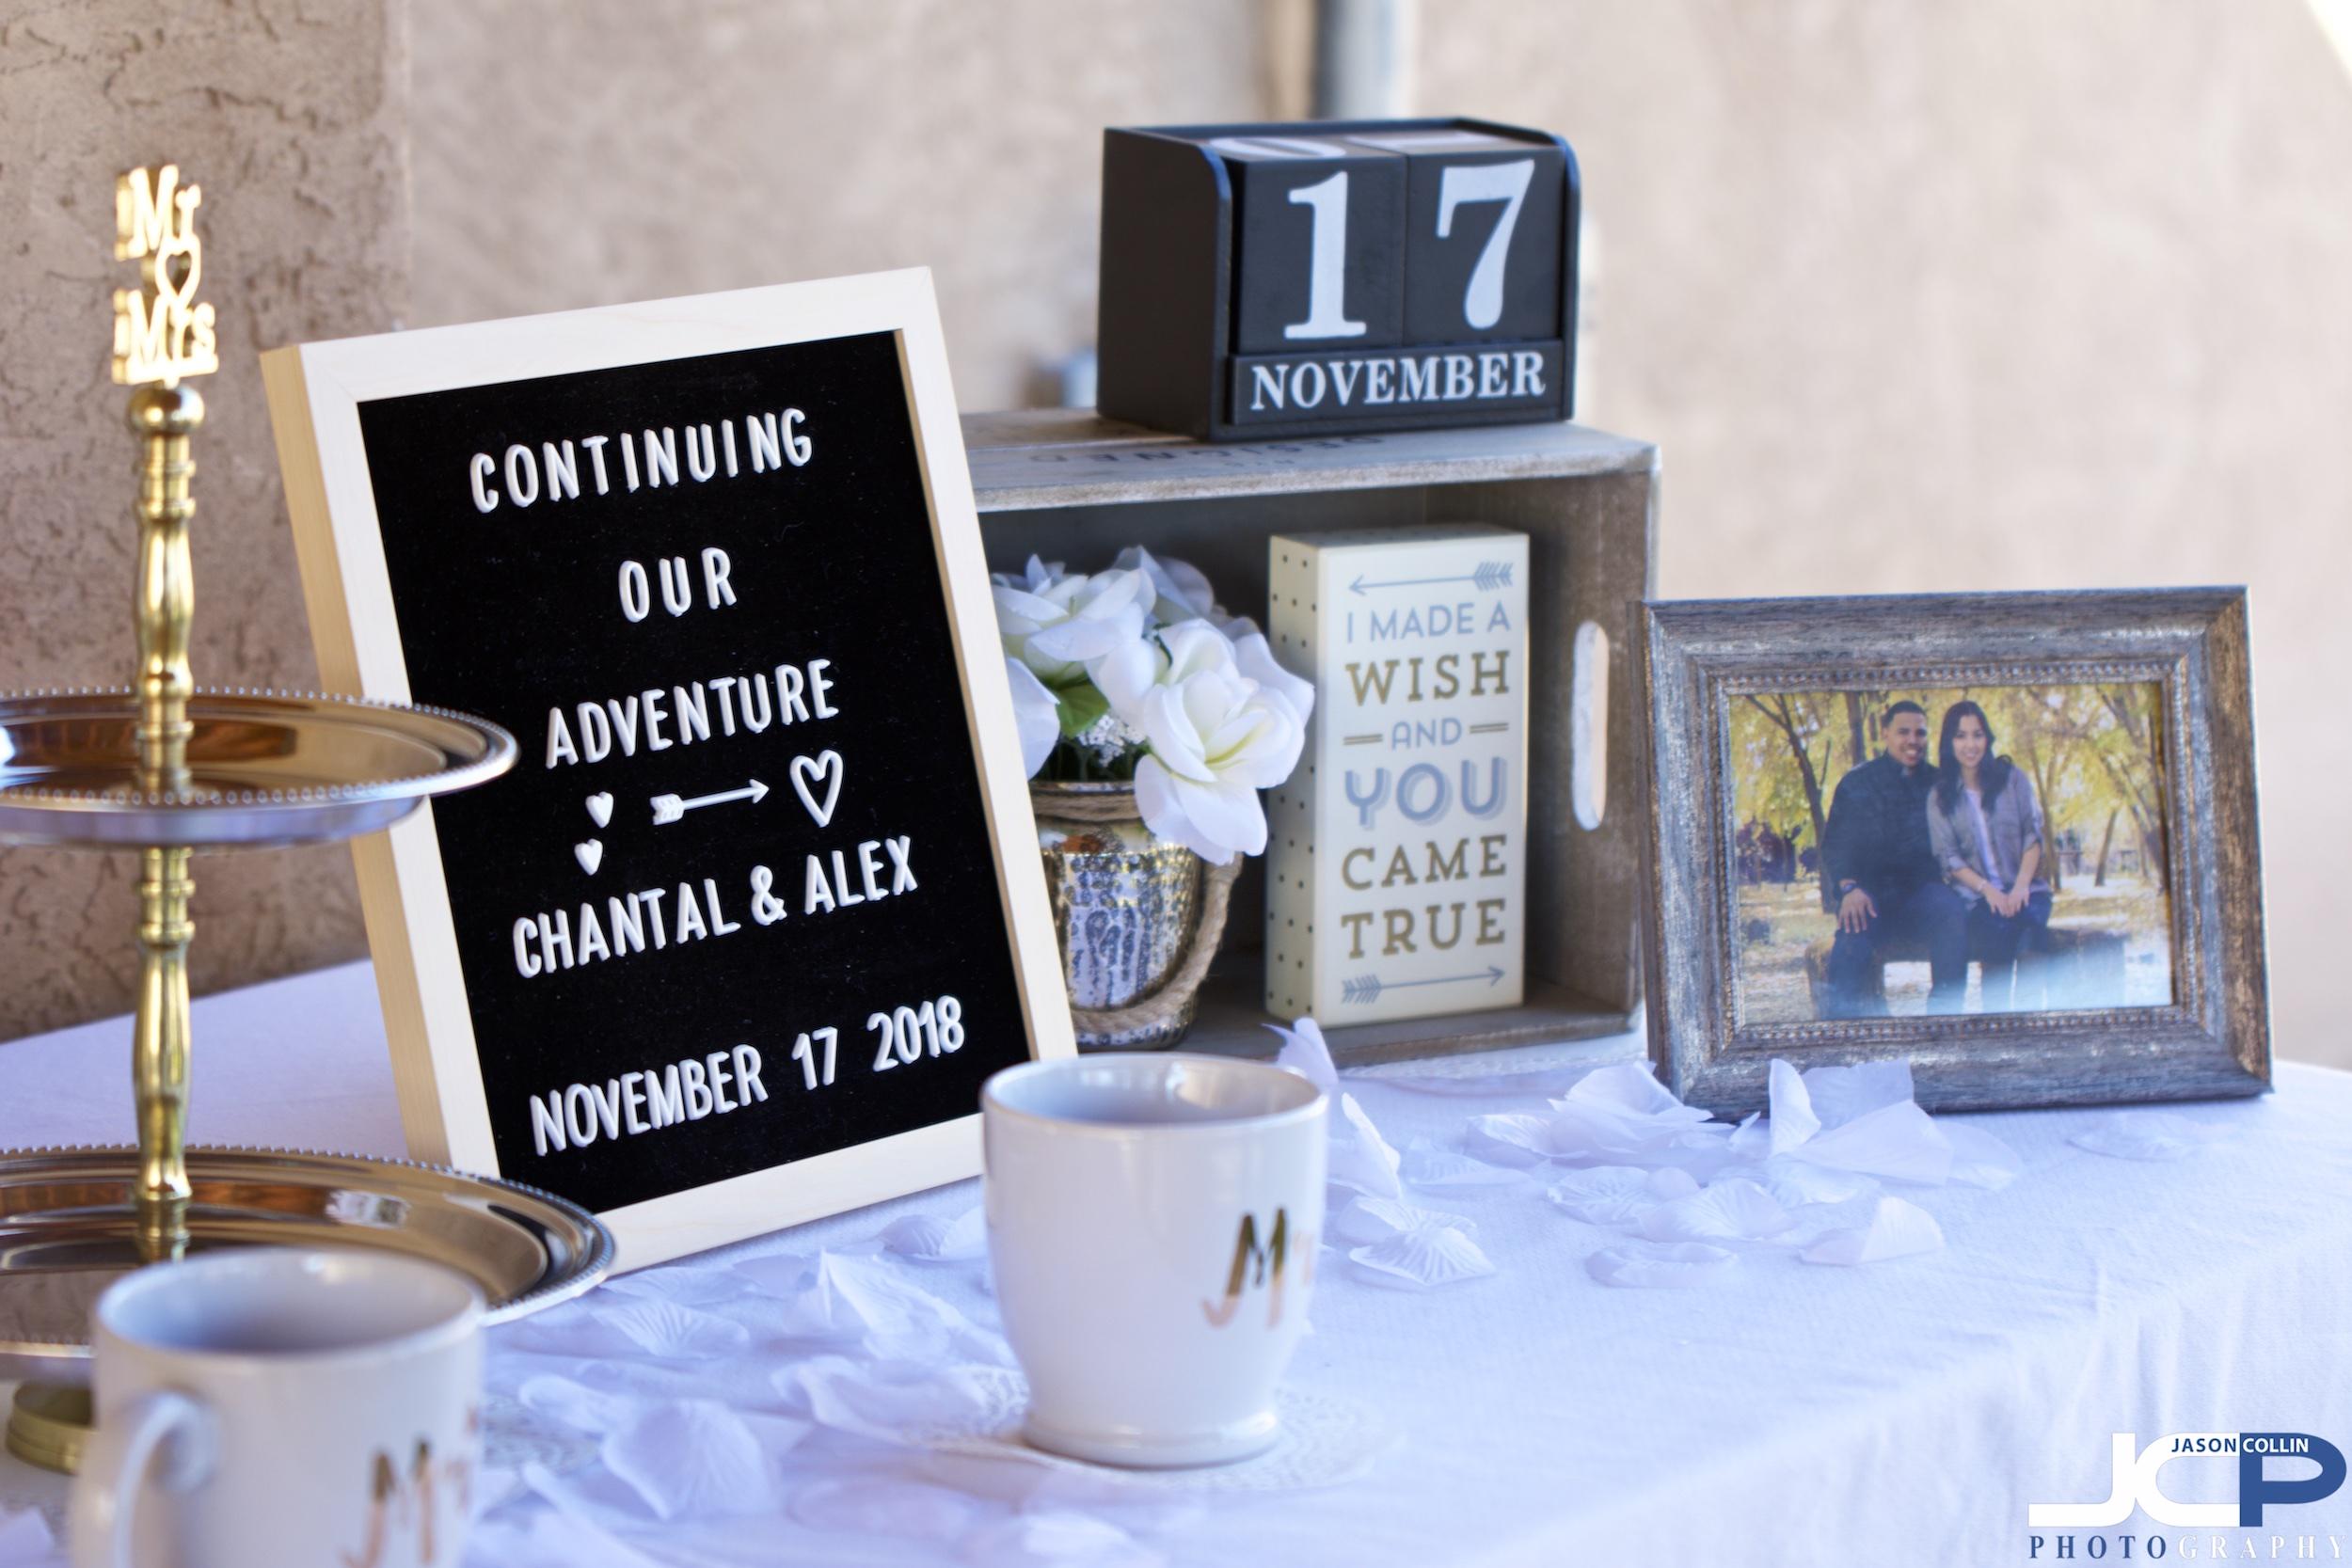 ac-11-17-2018-wedding-113483.jpg